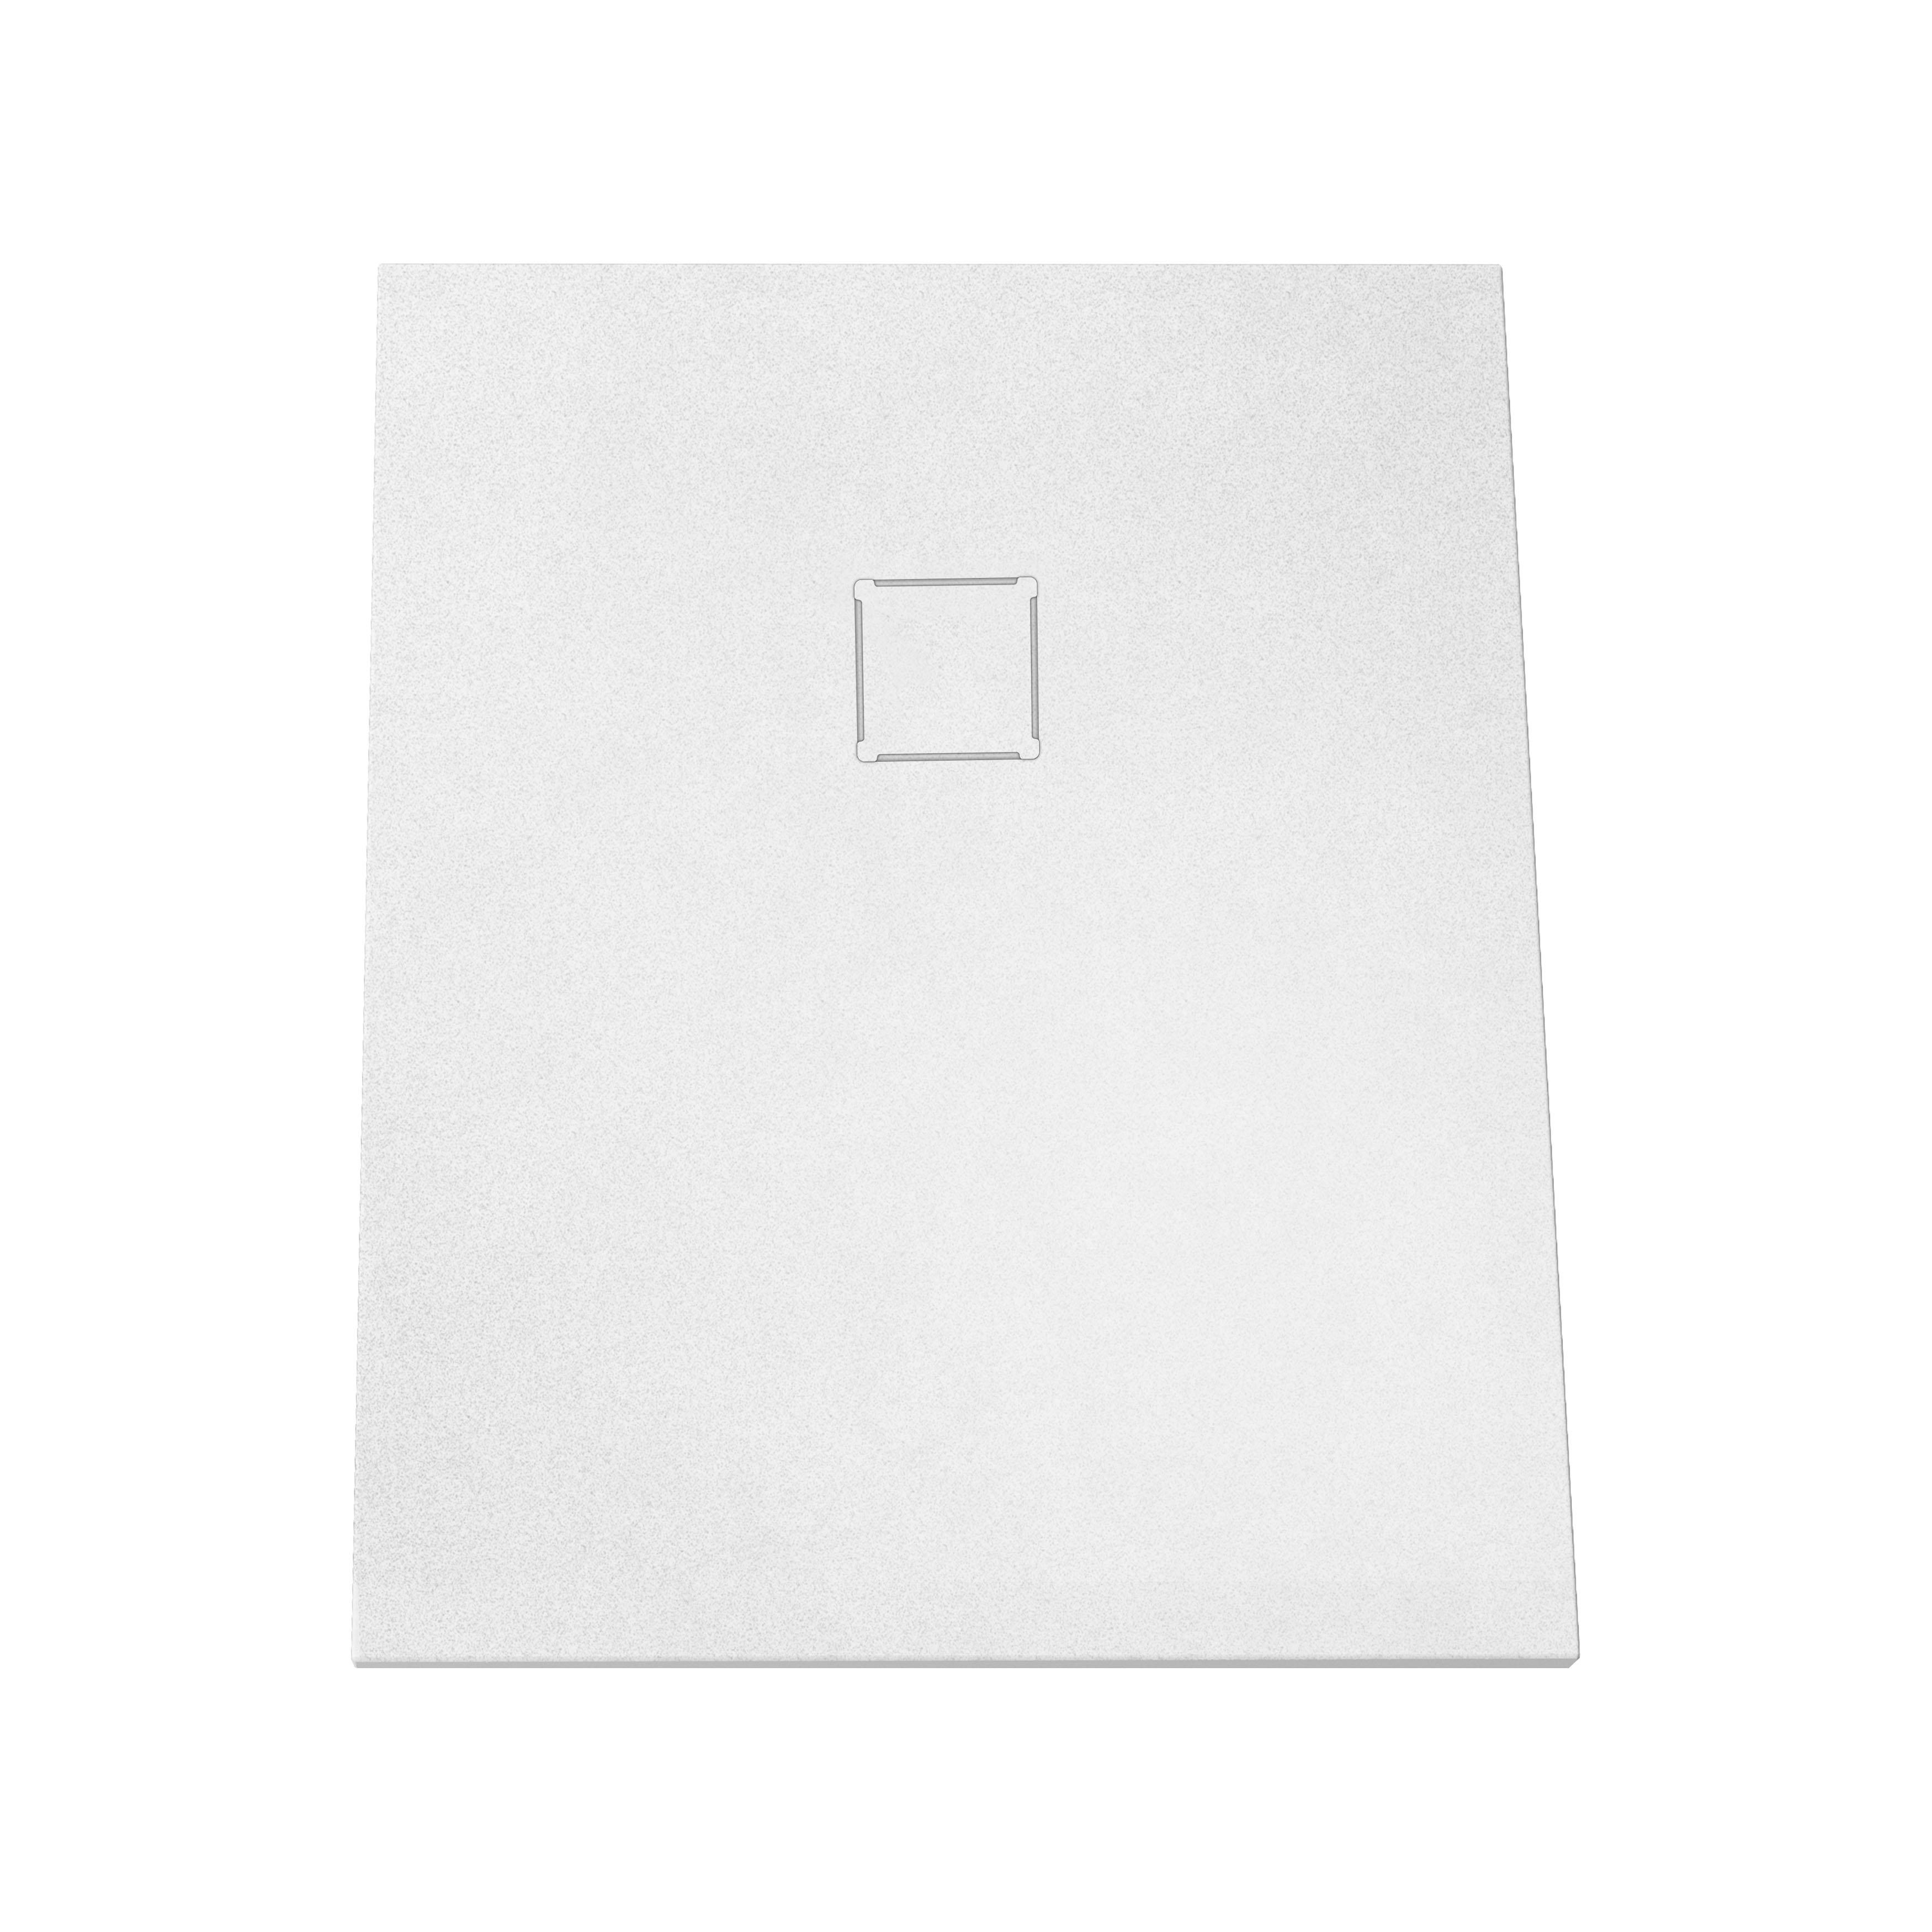 V-stone, receveur ultra plat en solid stone, 100  x  80 cm, blanc